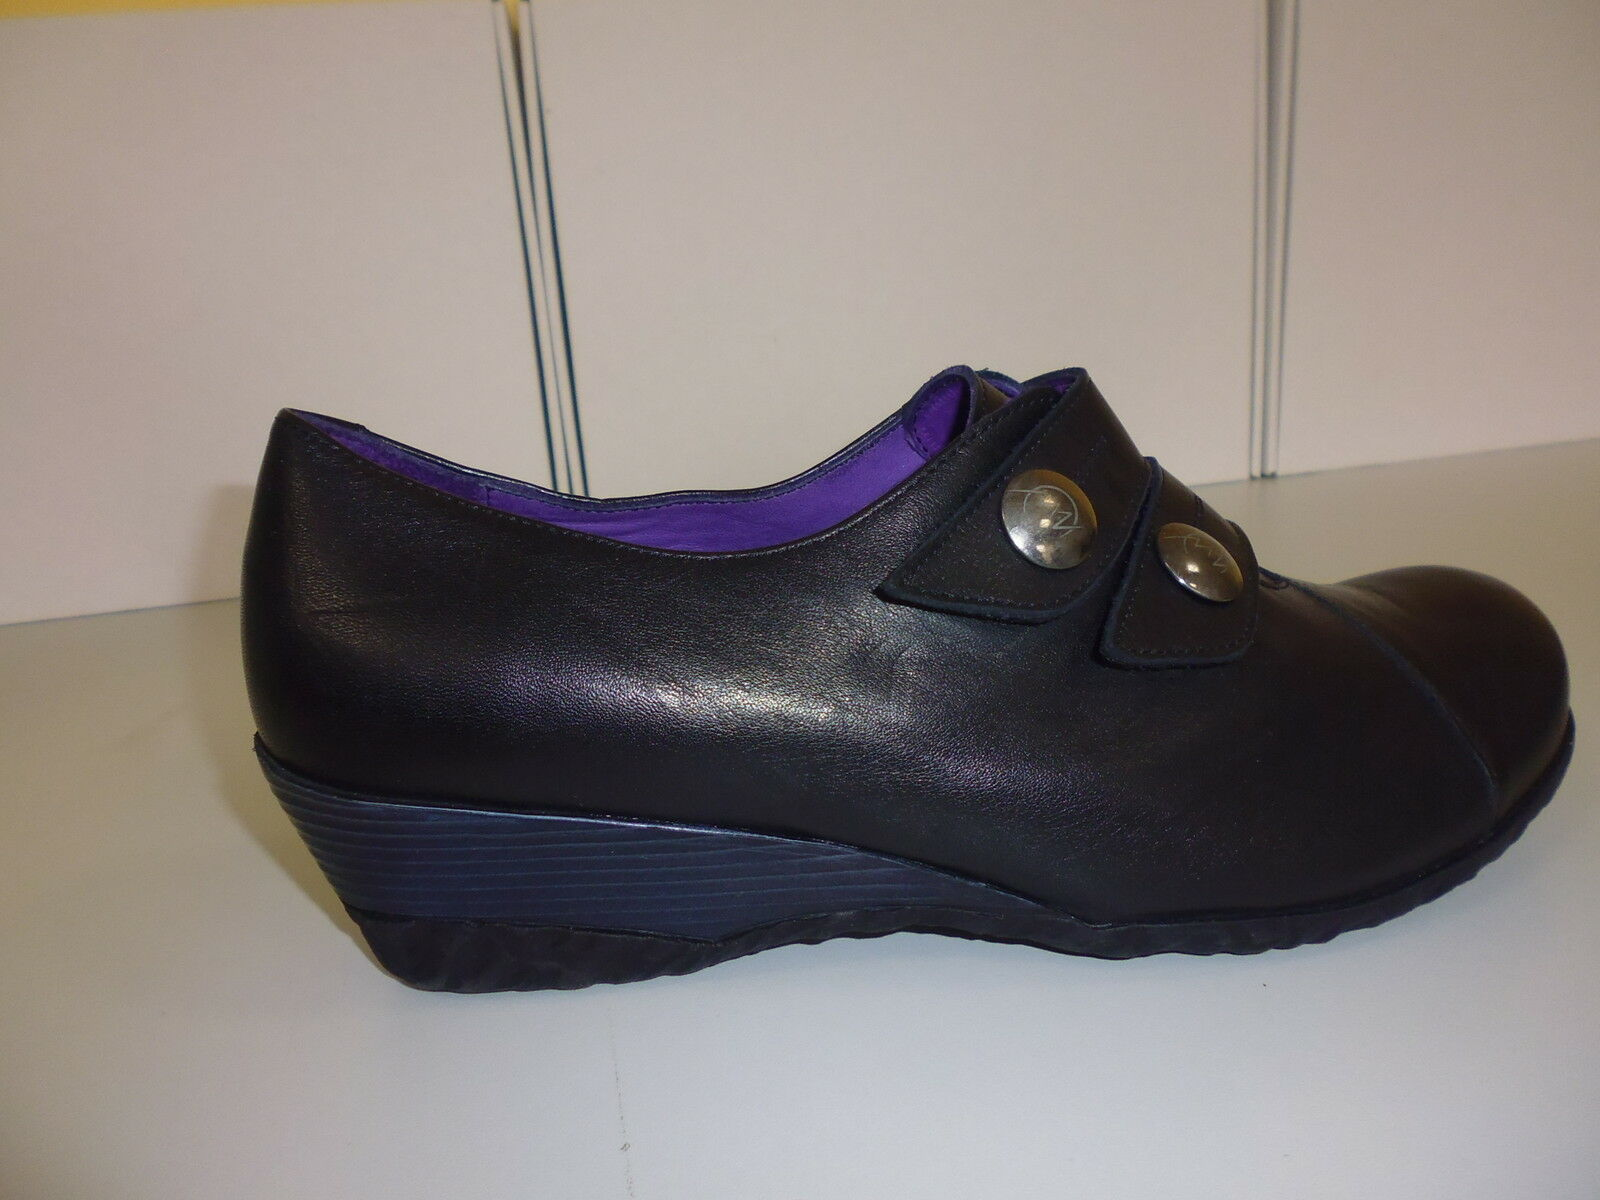 Chaussures Femmes Chaussures Slipper Velcro Pantoufles orKRONE noir taille 41 (7,5)